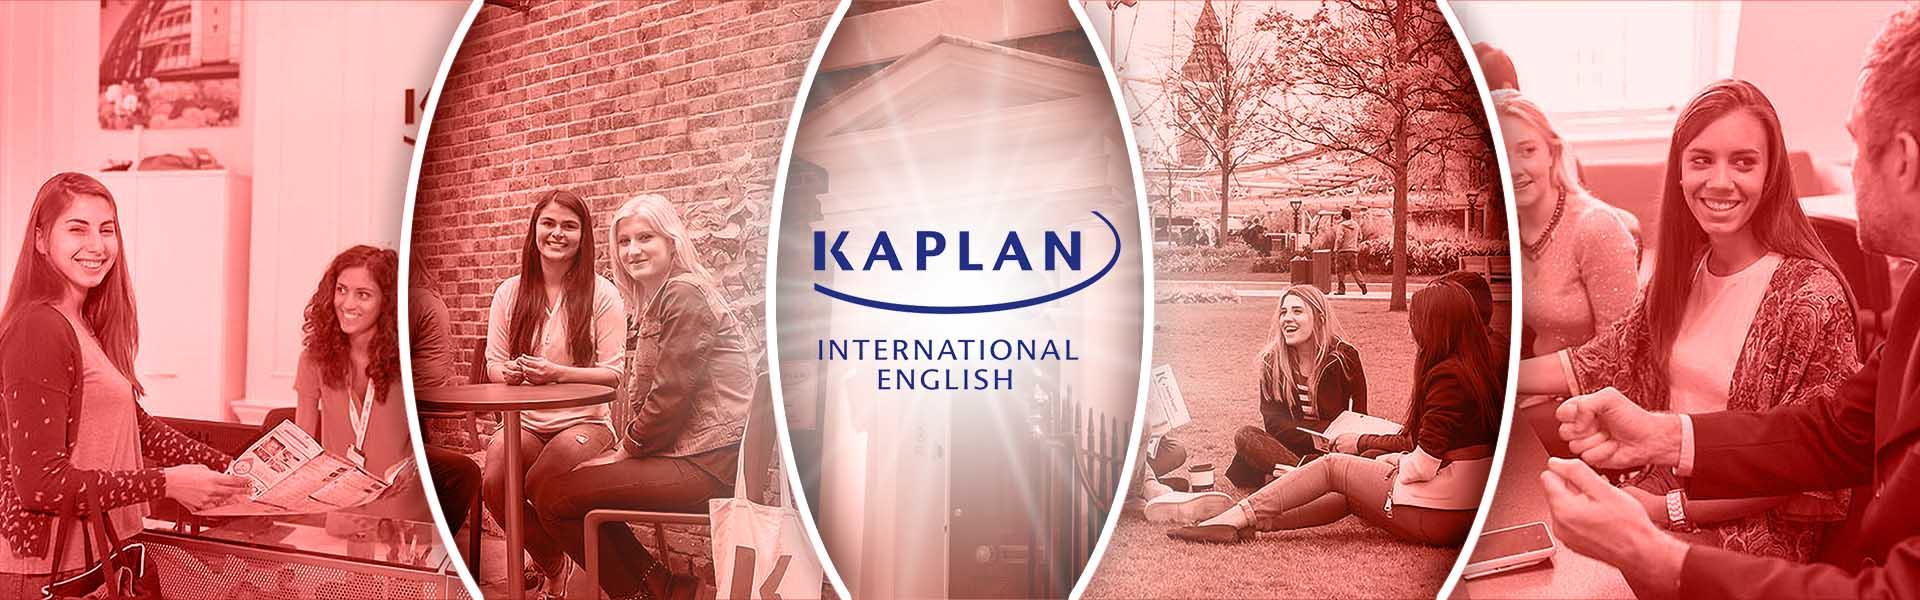 Kaplan International London Covent Garden